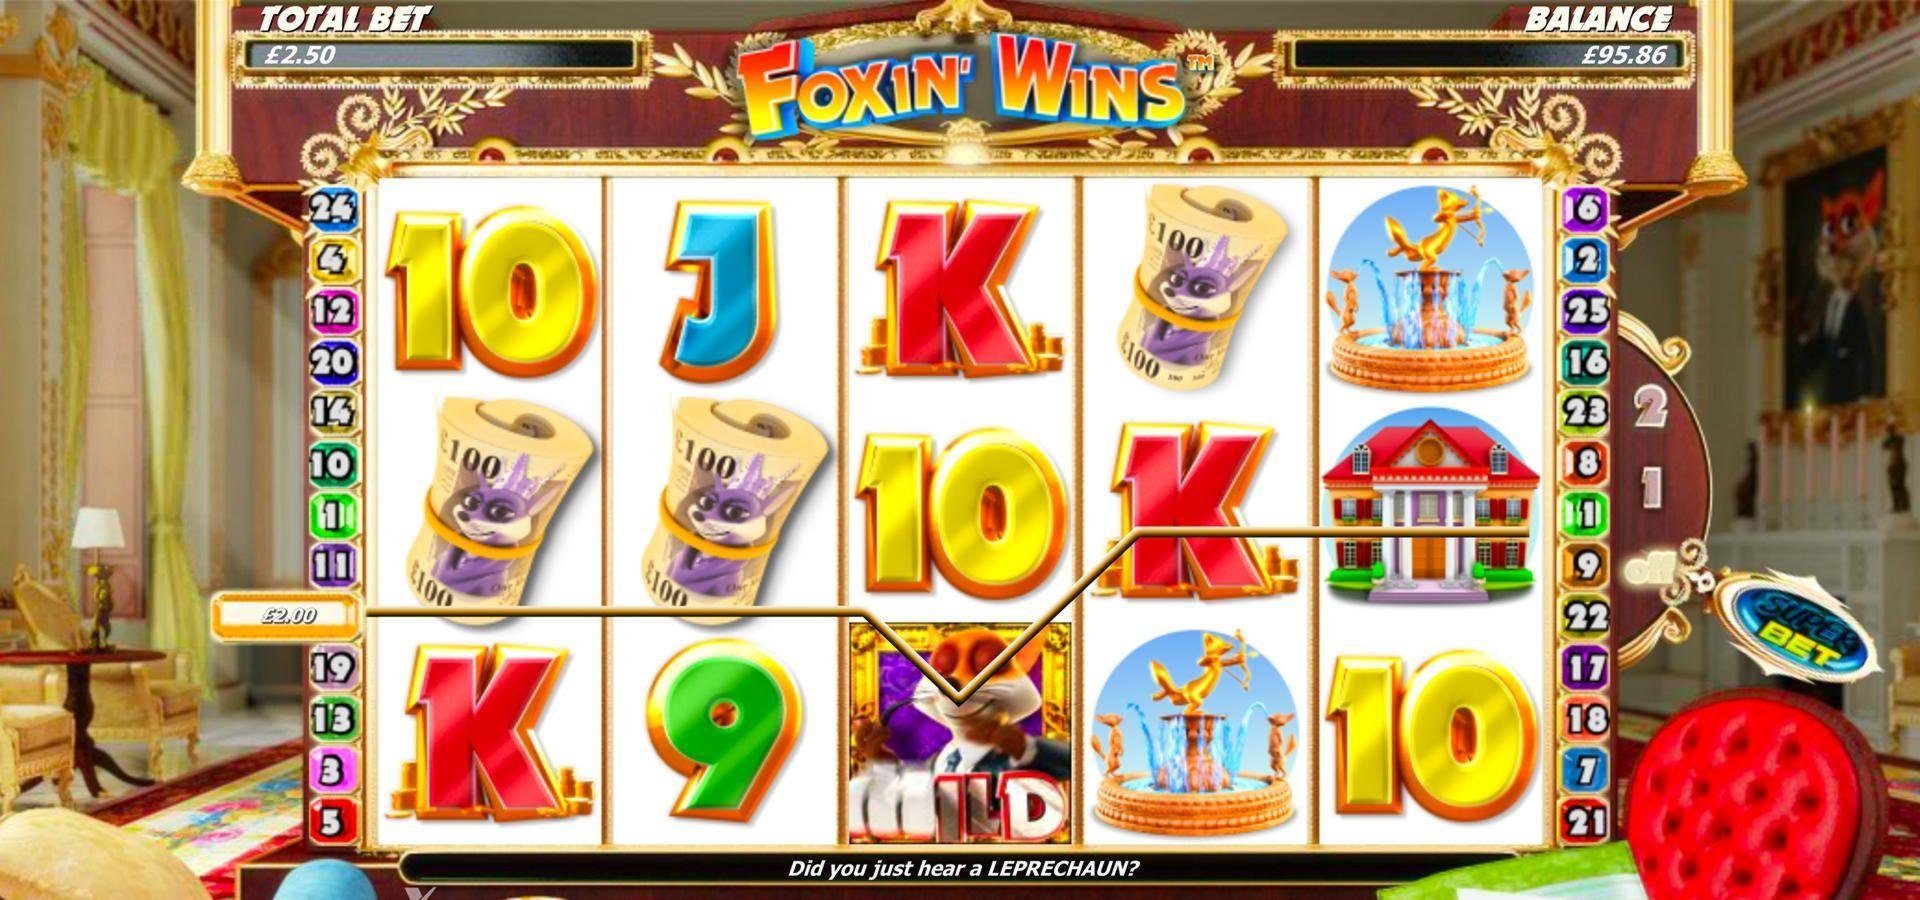 Eur 170 FREE Chip Casino at Treasure Island Jackpots